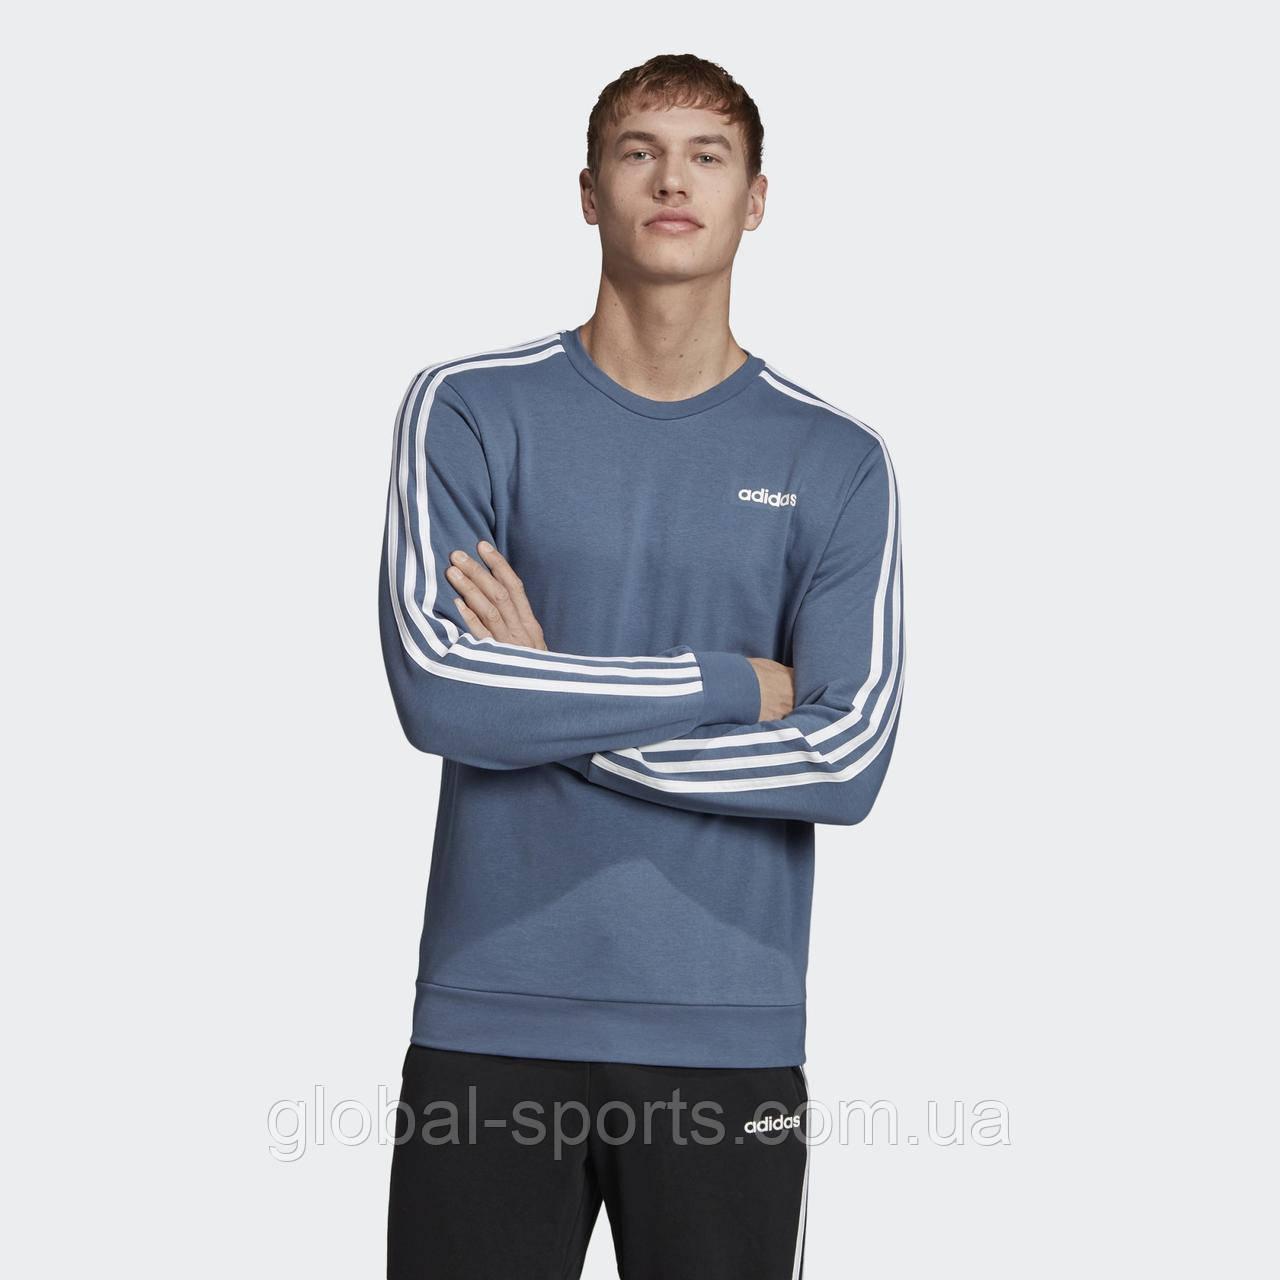 Чоловічий джемпер Adidas Essentials 3-Stripes (Артикул:EI9838)